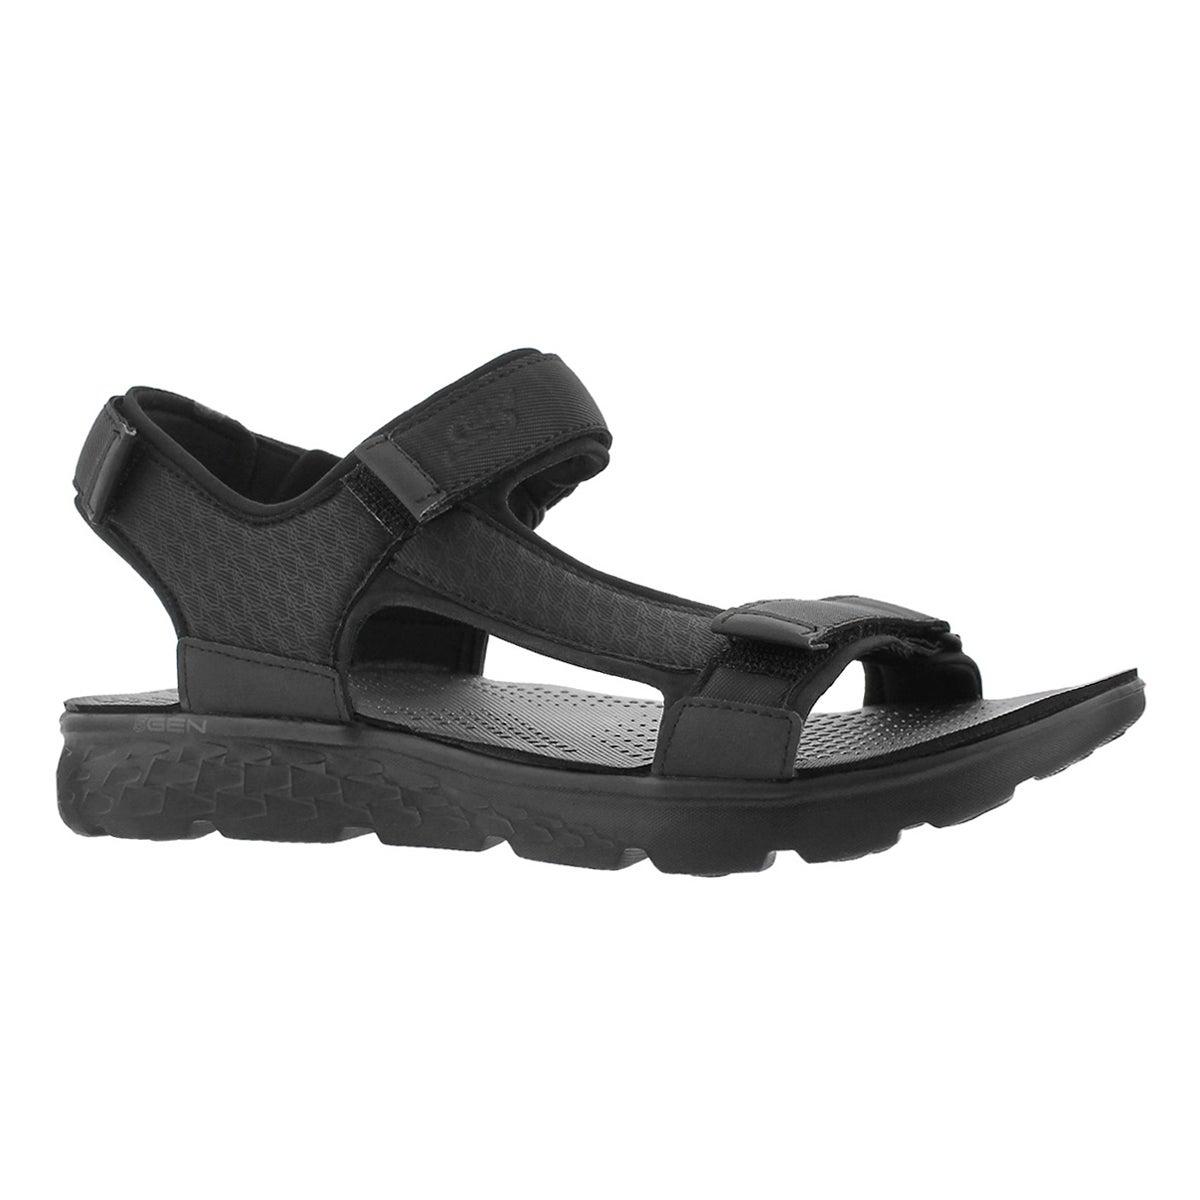 Sandalias De Los Hombres Skechers uNBQnxxr